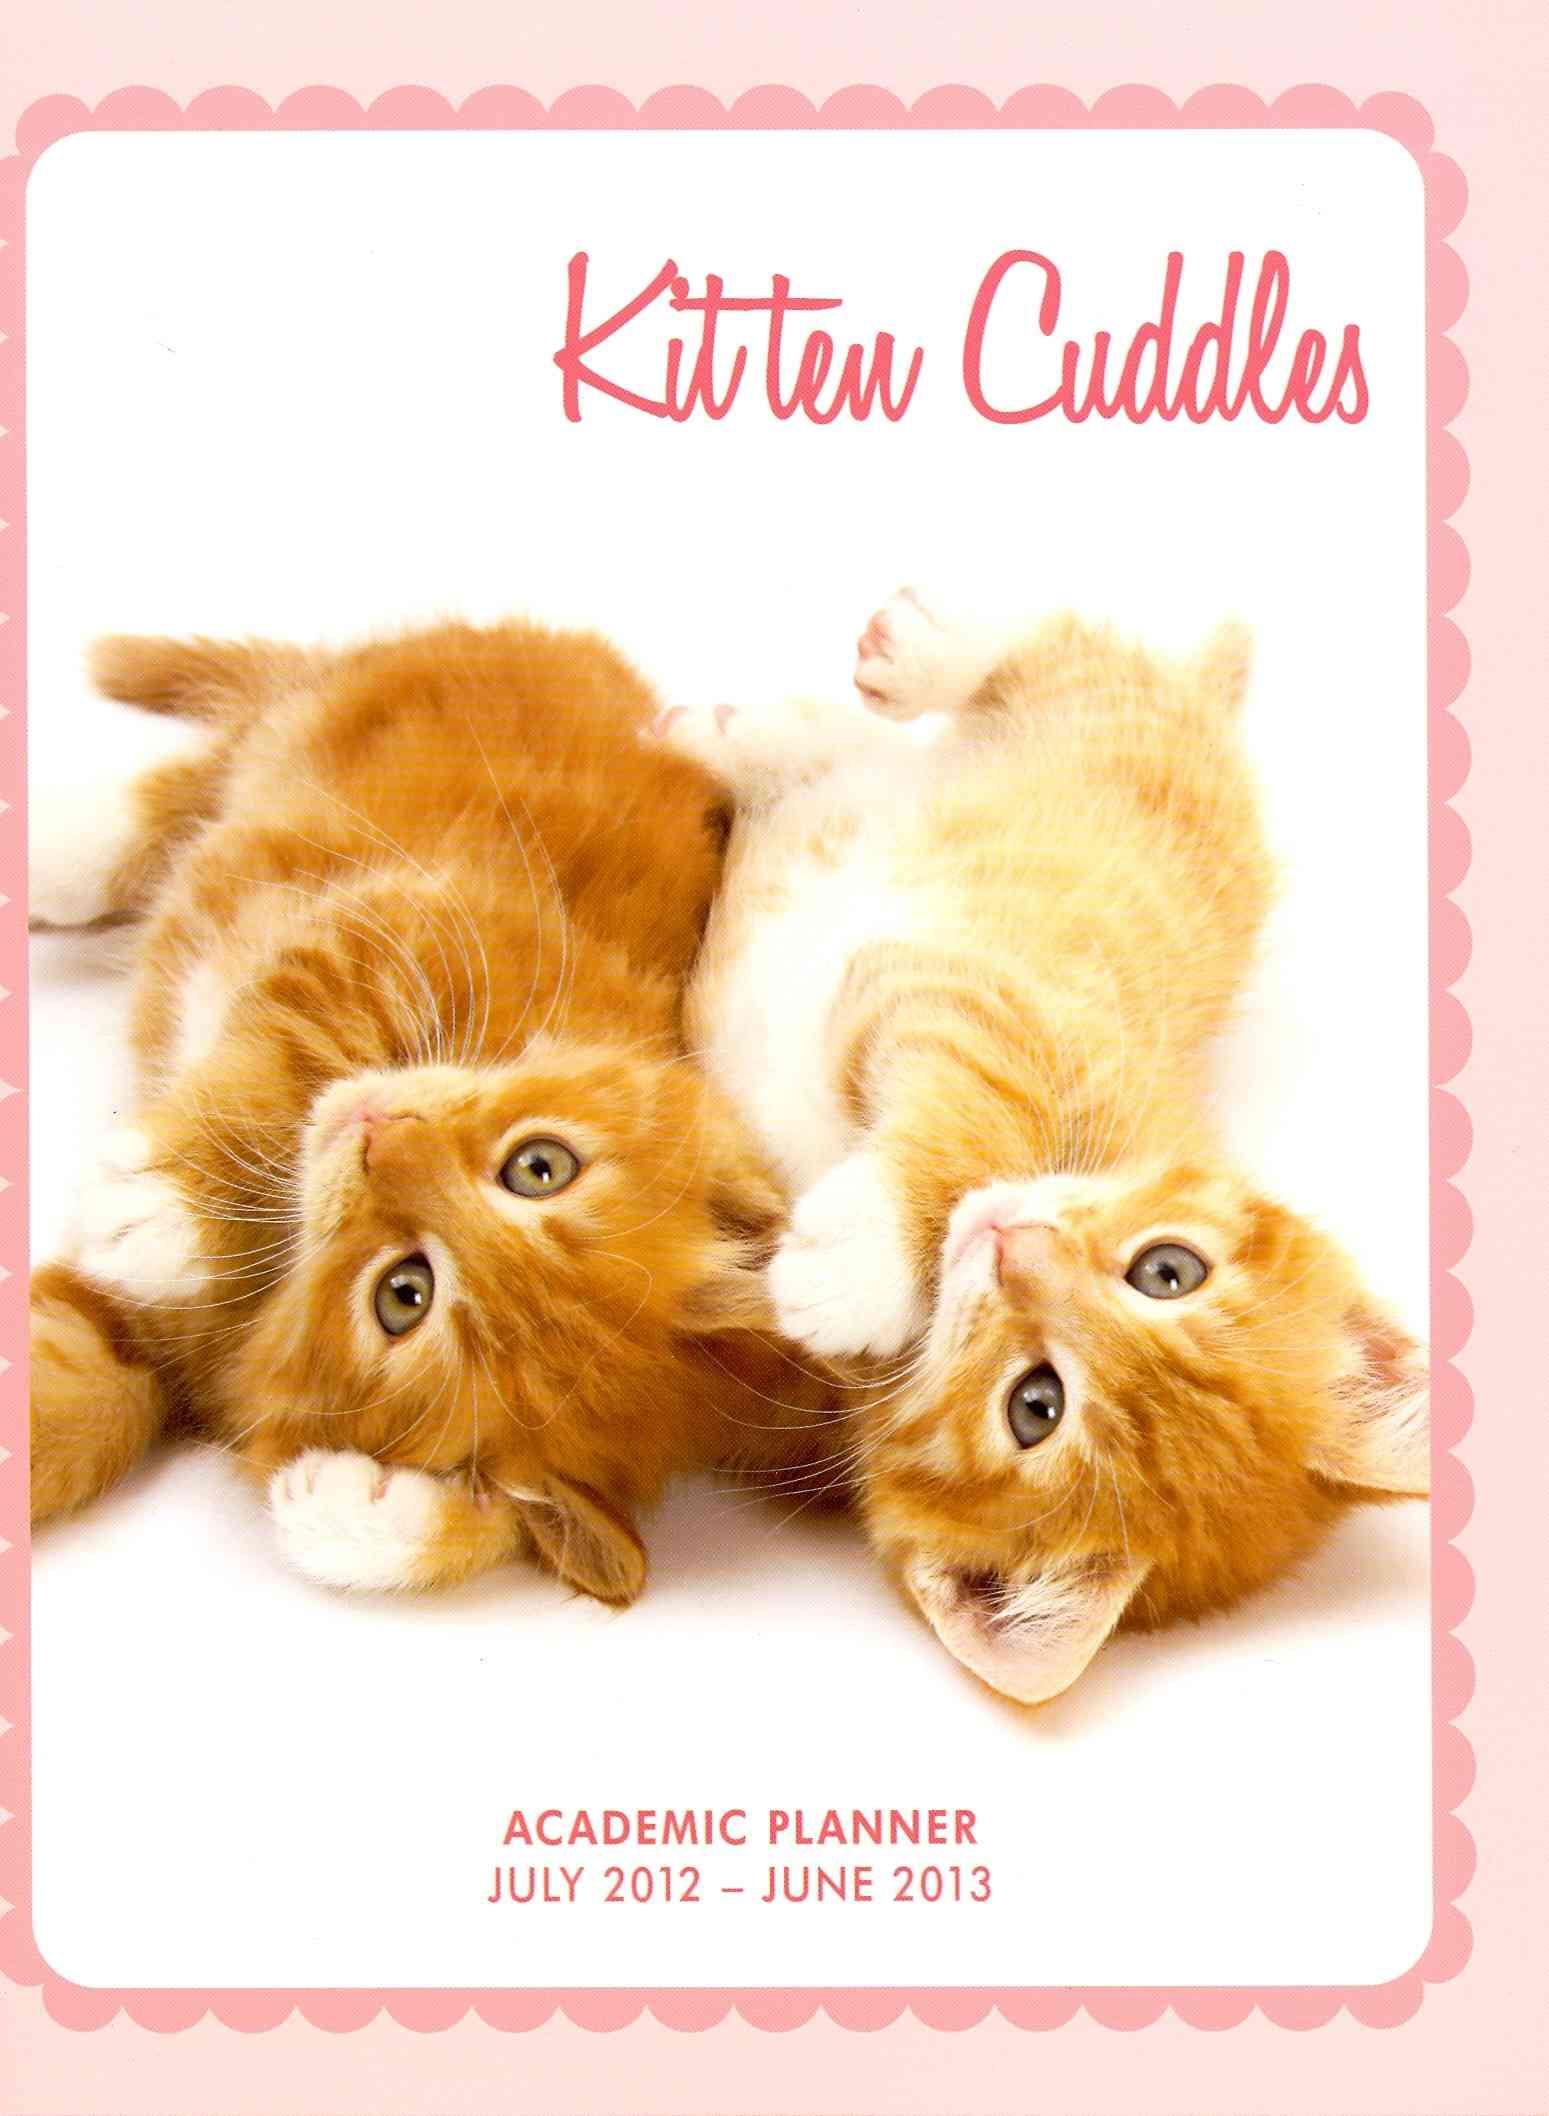 Kitten Cuddles 2013 Academic Planner